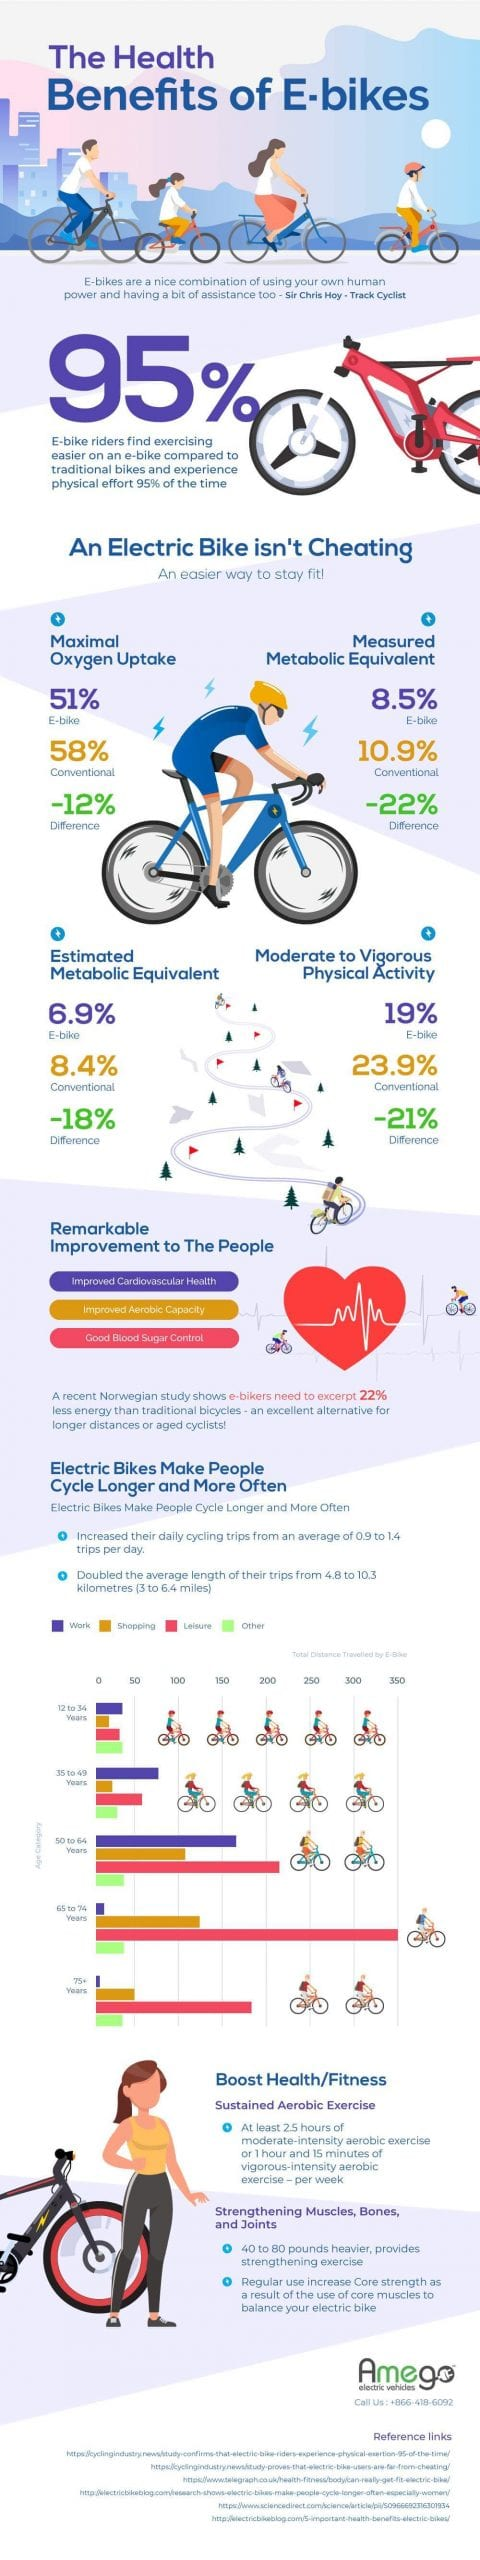 The Health Benefits of E-bikes